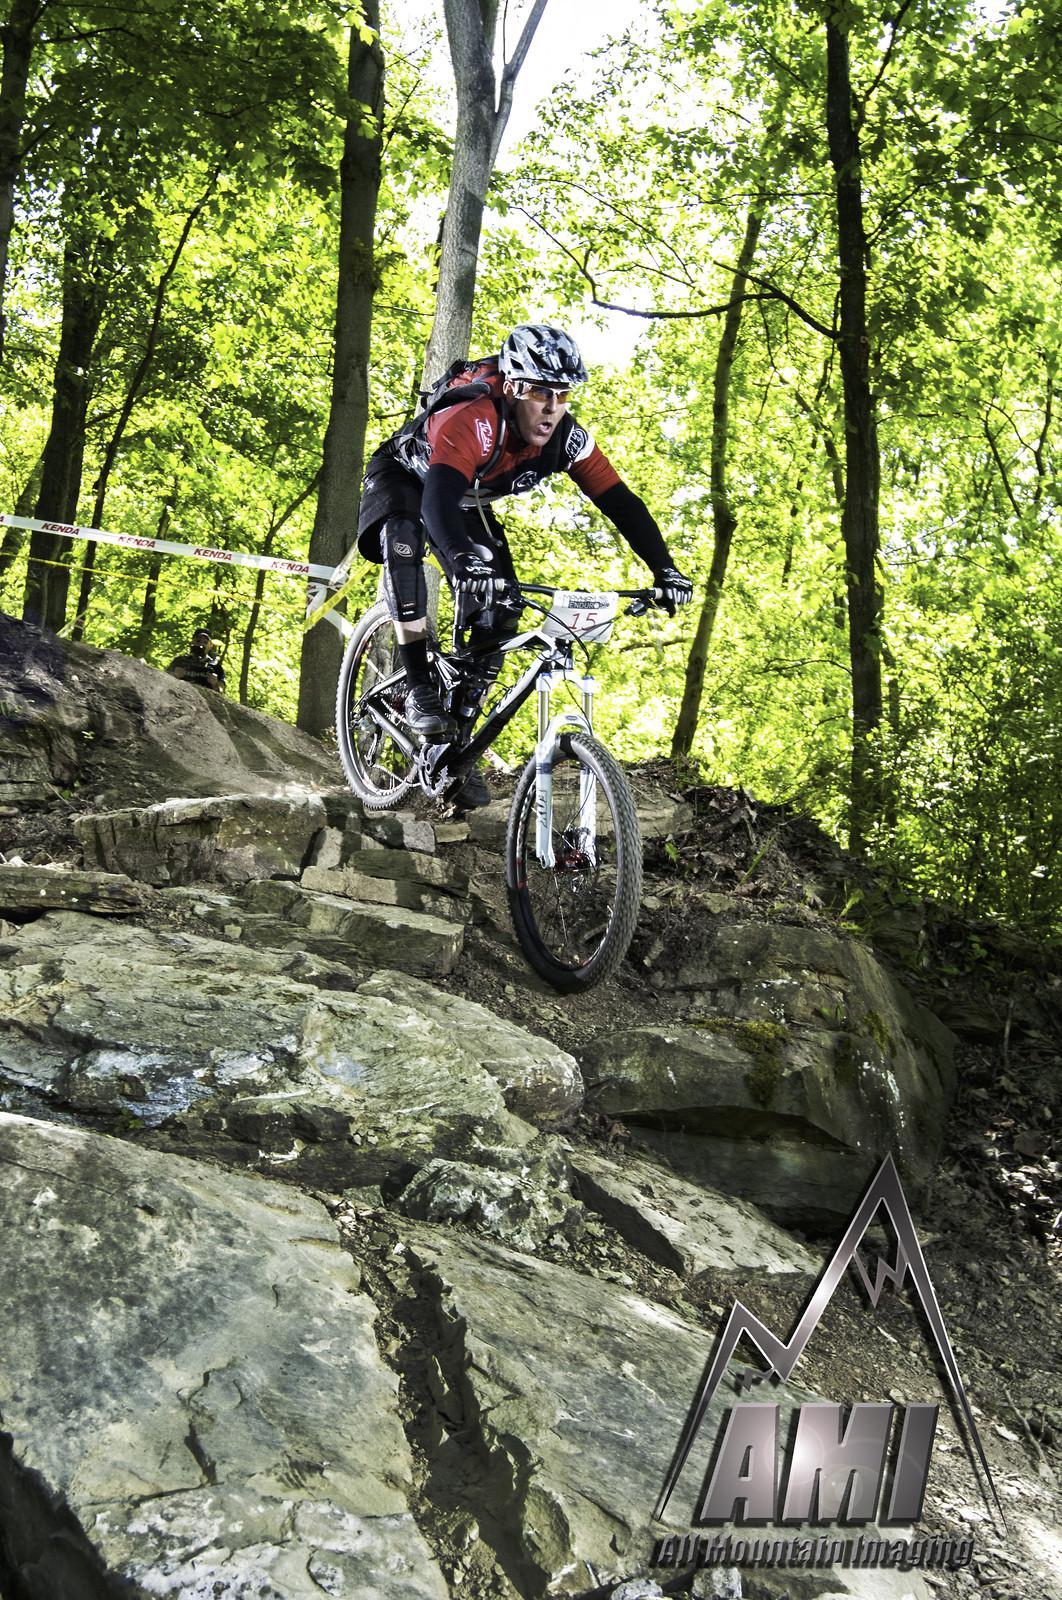 Mayhem A 010 - AllMountainImaging - Mountain Biking Pictures - Vital MTB